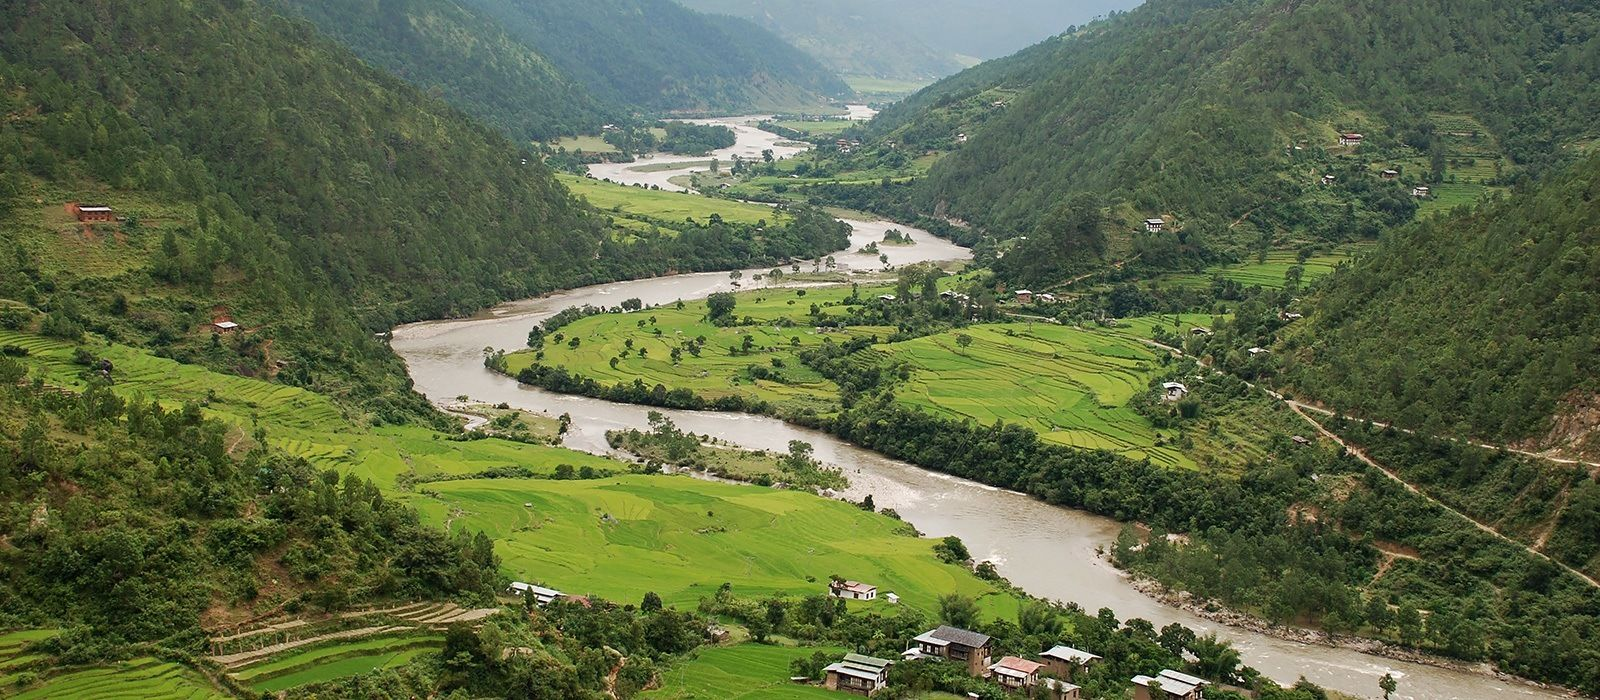 Nepalreise: Paläste, Tiger und Himalaya Urlaub 6